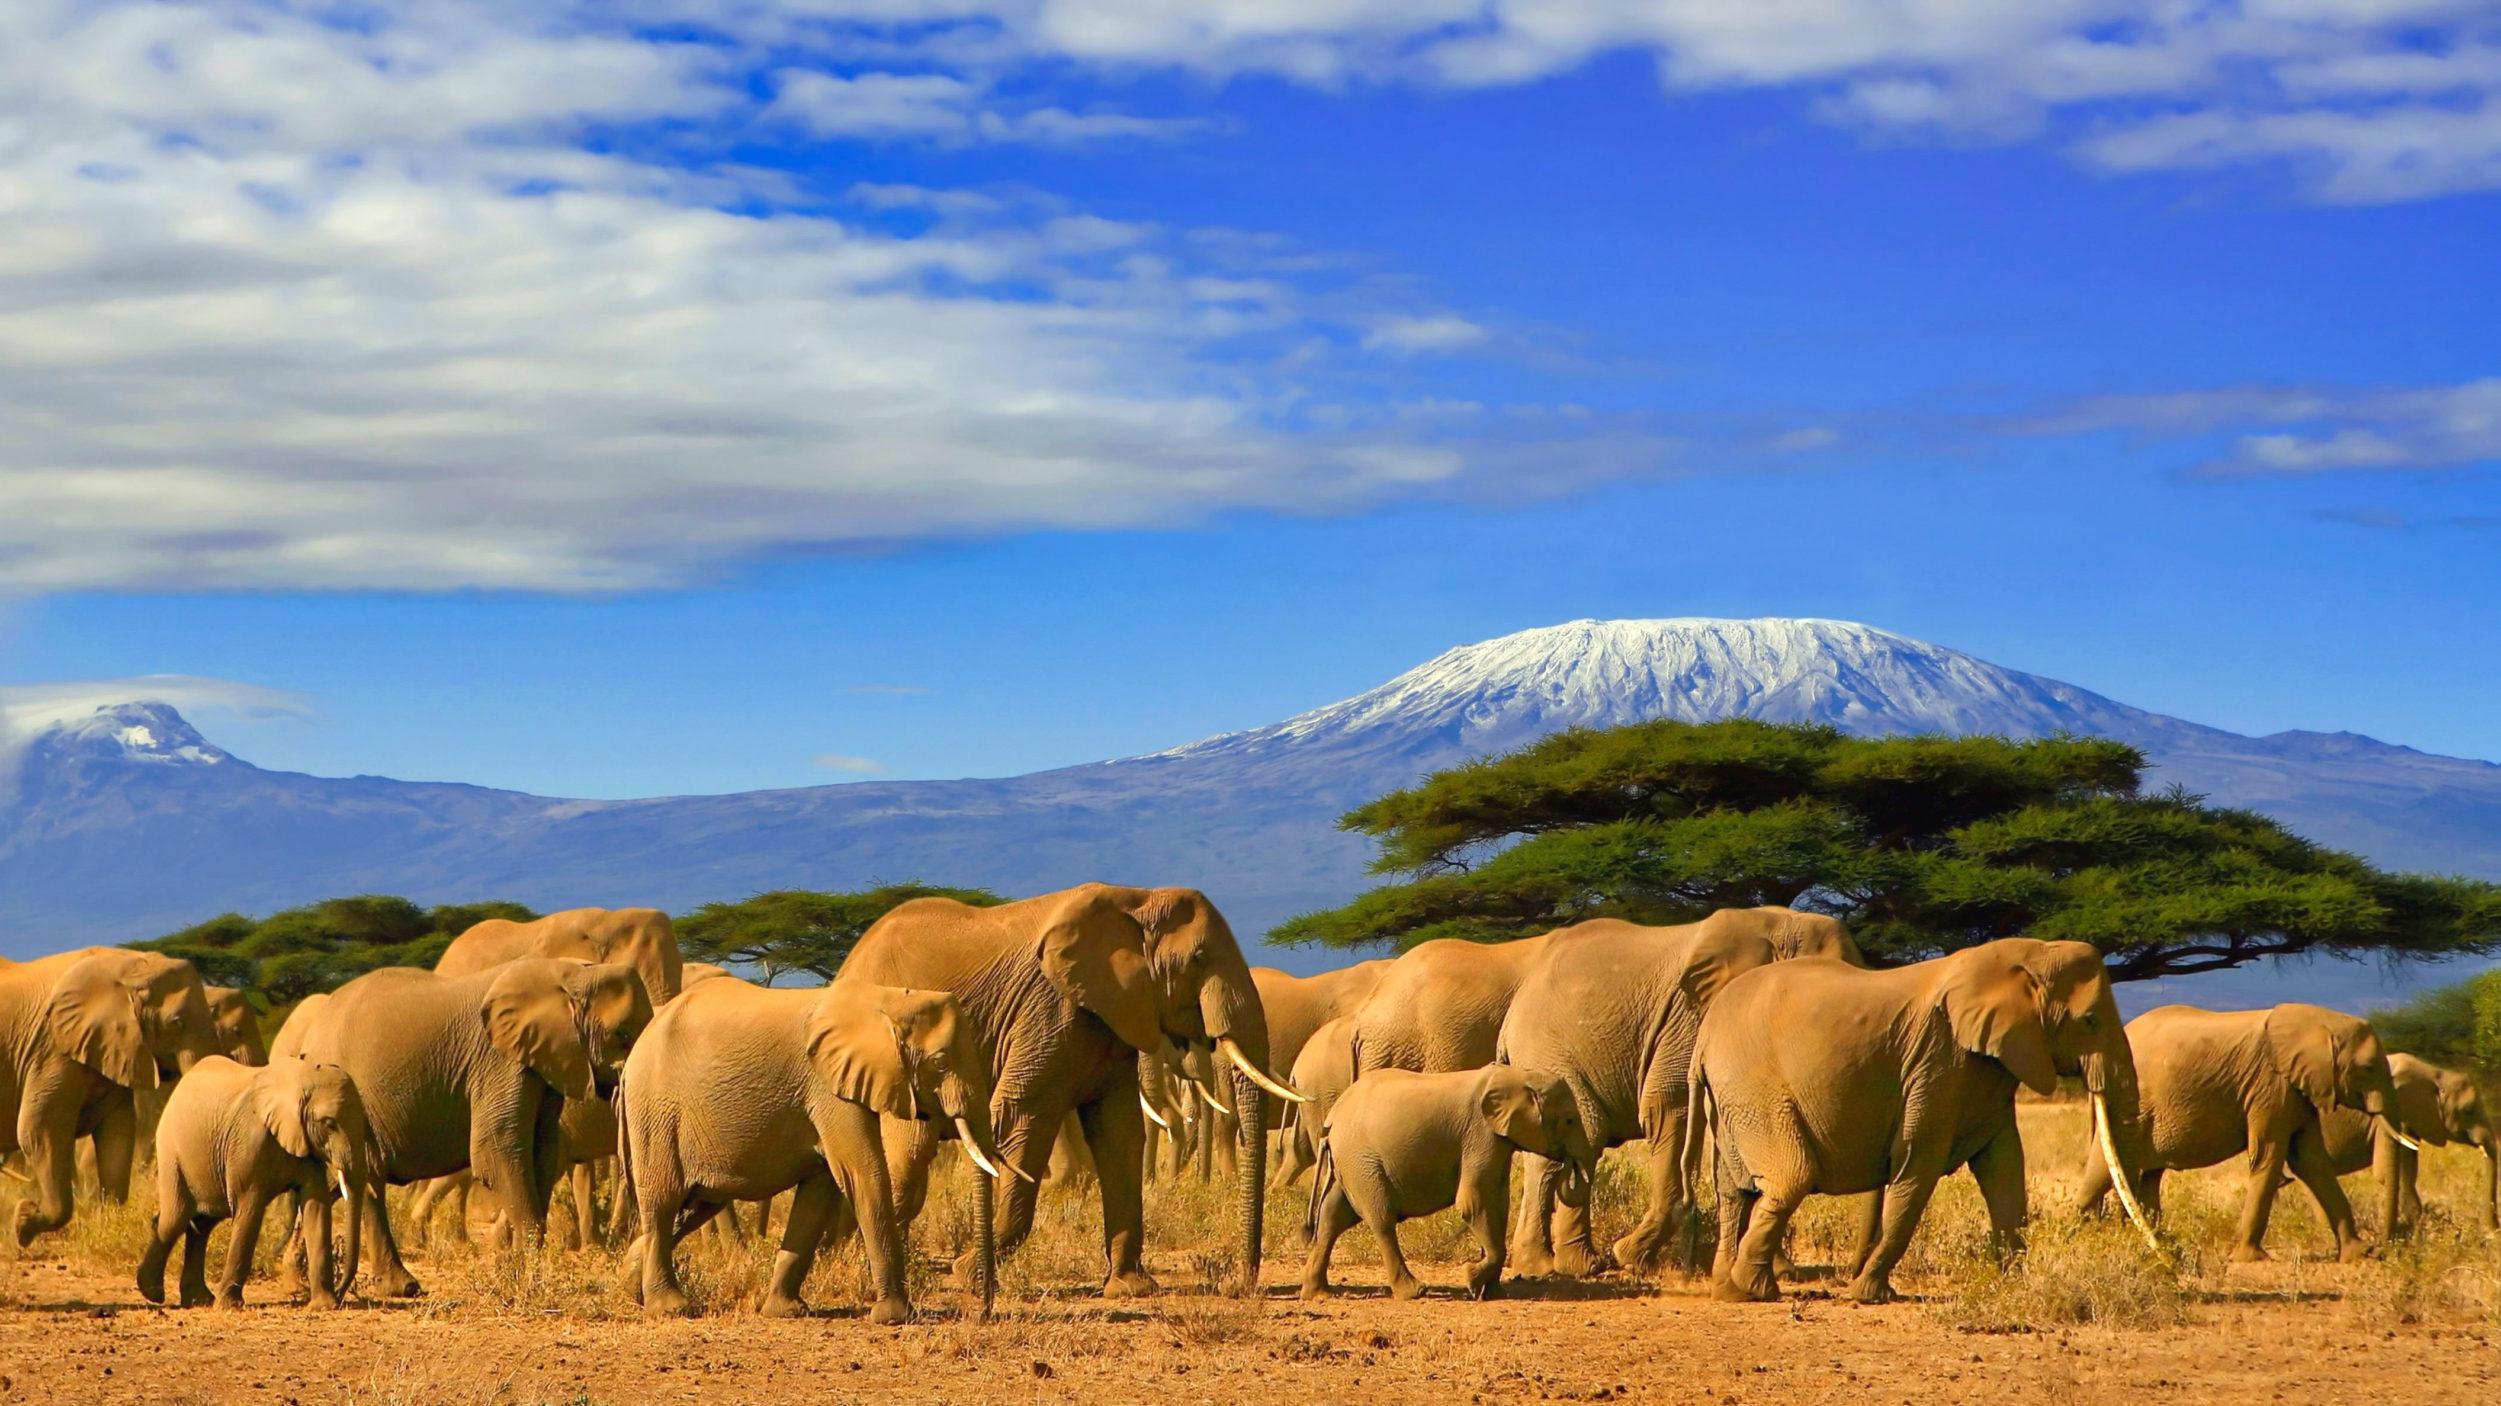 Tanzania [shutterstock]